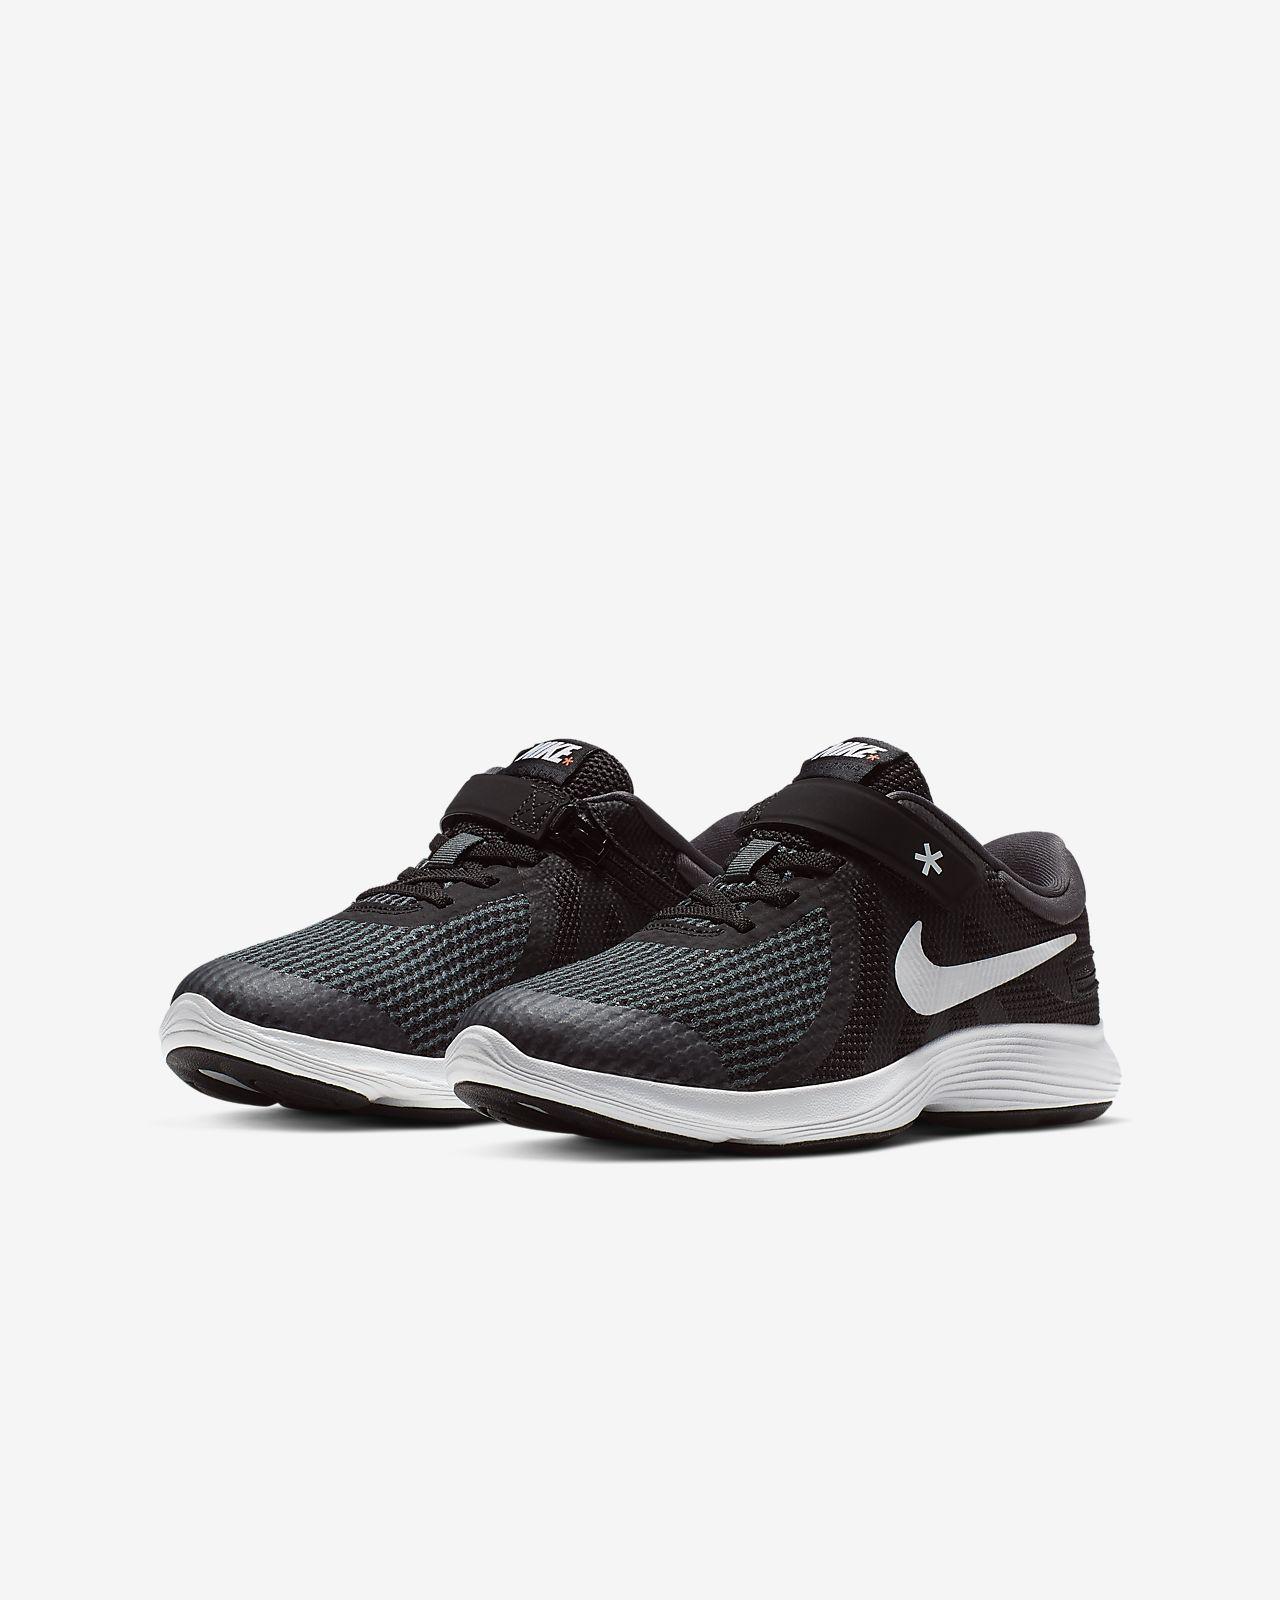 promo code 3b65e 86be3 ... Nike Revolution 4 FlyEase Older Kids  Shoe